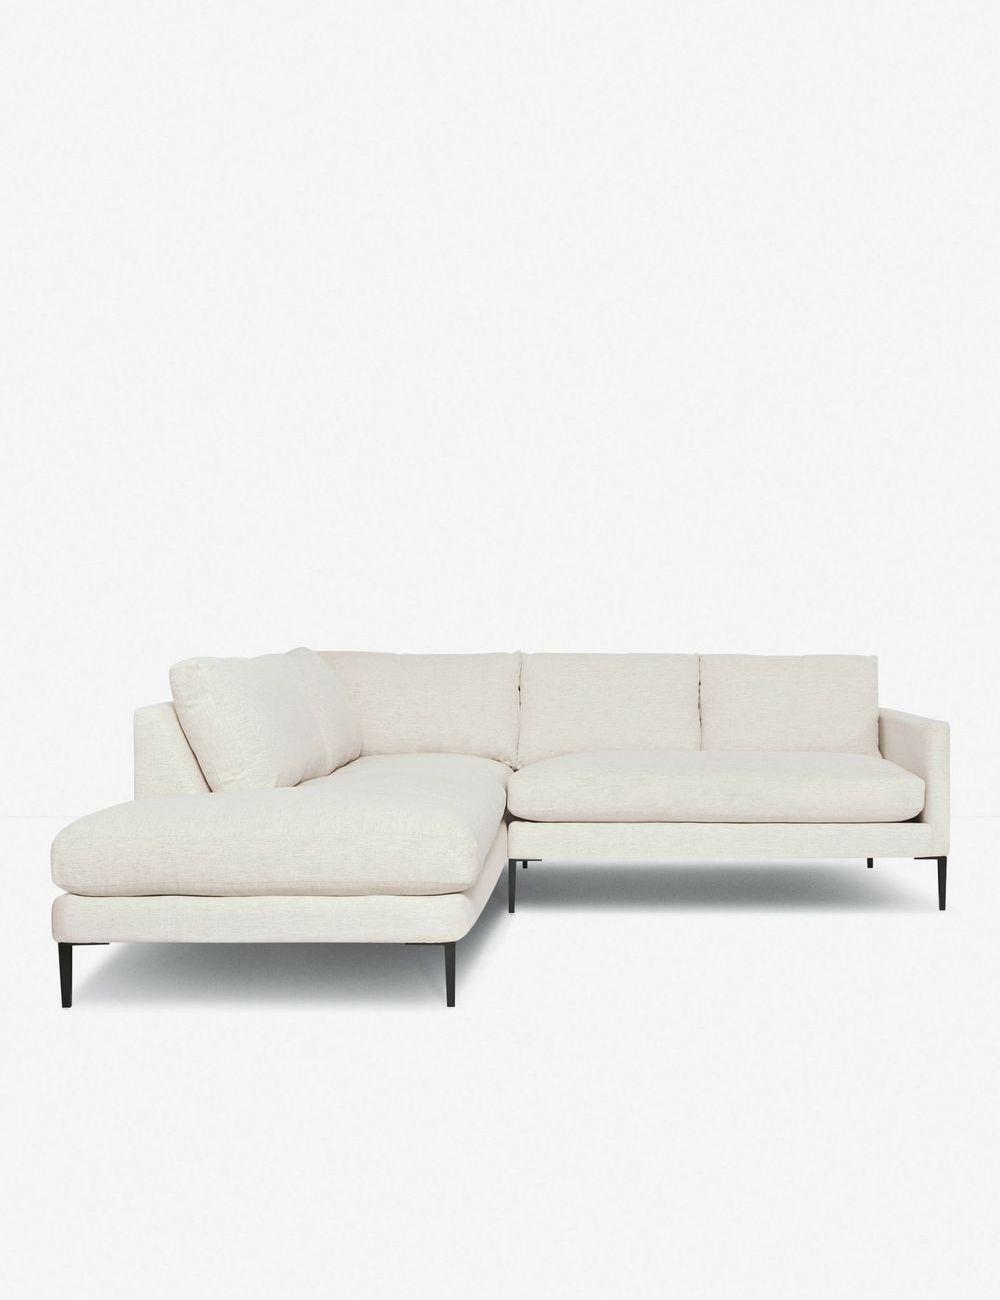 Allisen Left-Facing Bumper Sectional Sofa, Sand